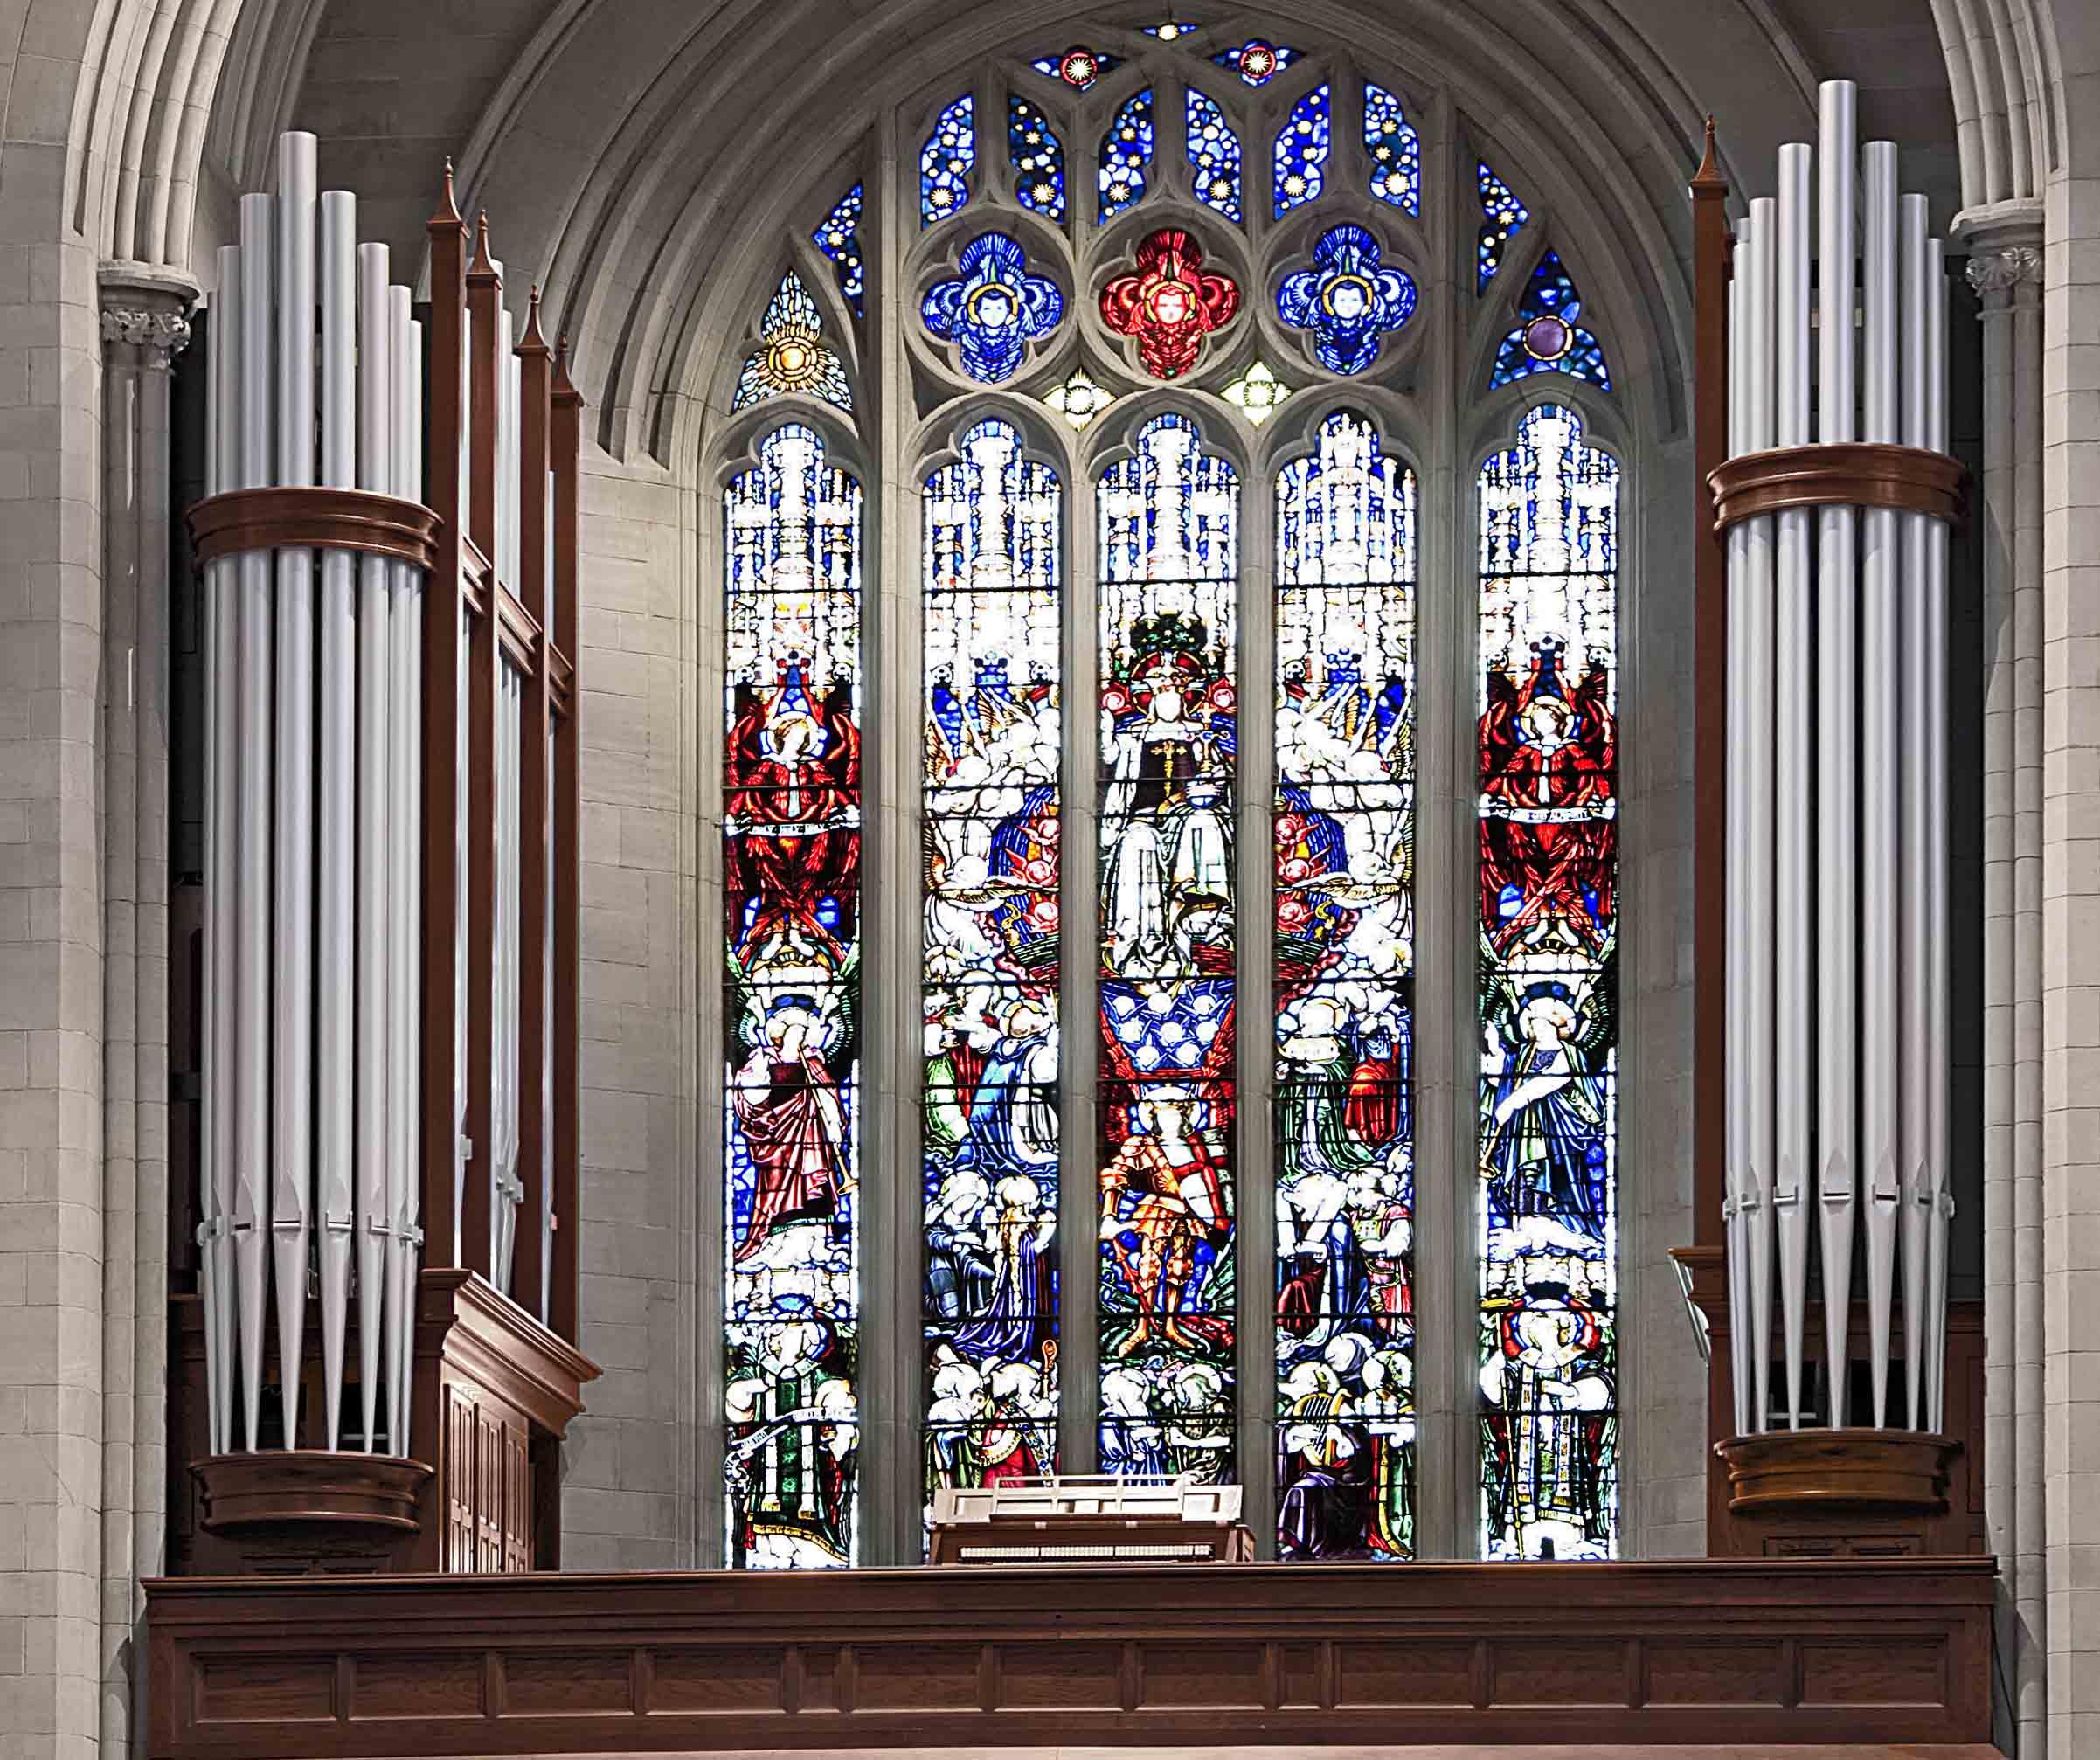 New Antiphonal organ made by Spencer Organ Company, St. John's Cathedral, Denver, Colorado